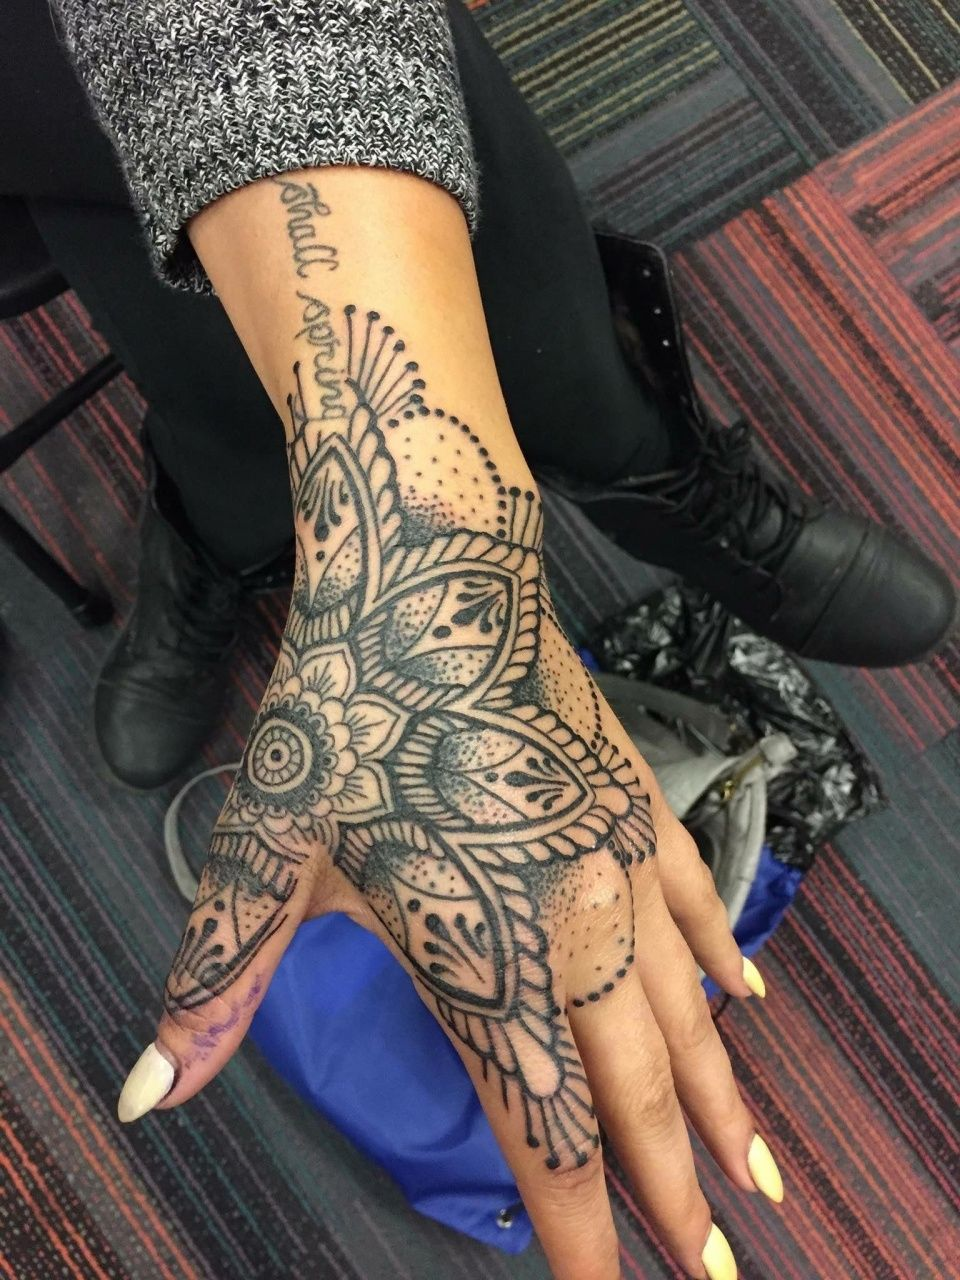 Hand Tattoos Hurt In 2020 Tribal Hand Tattoos Hand Tattoos For Women Hand Tattoos